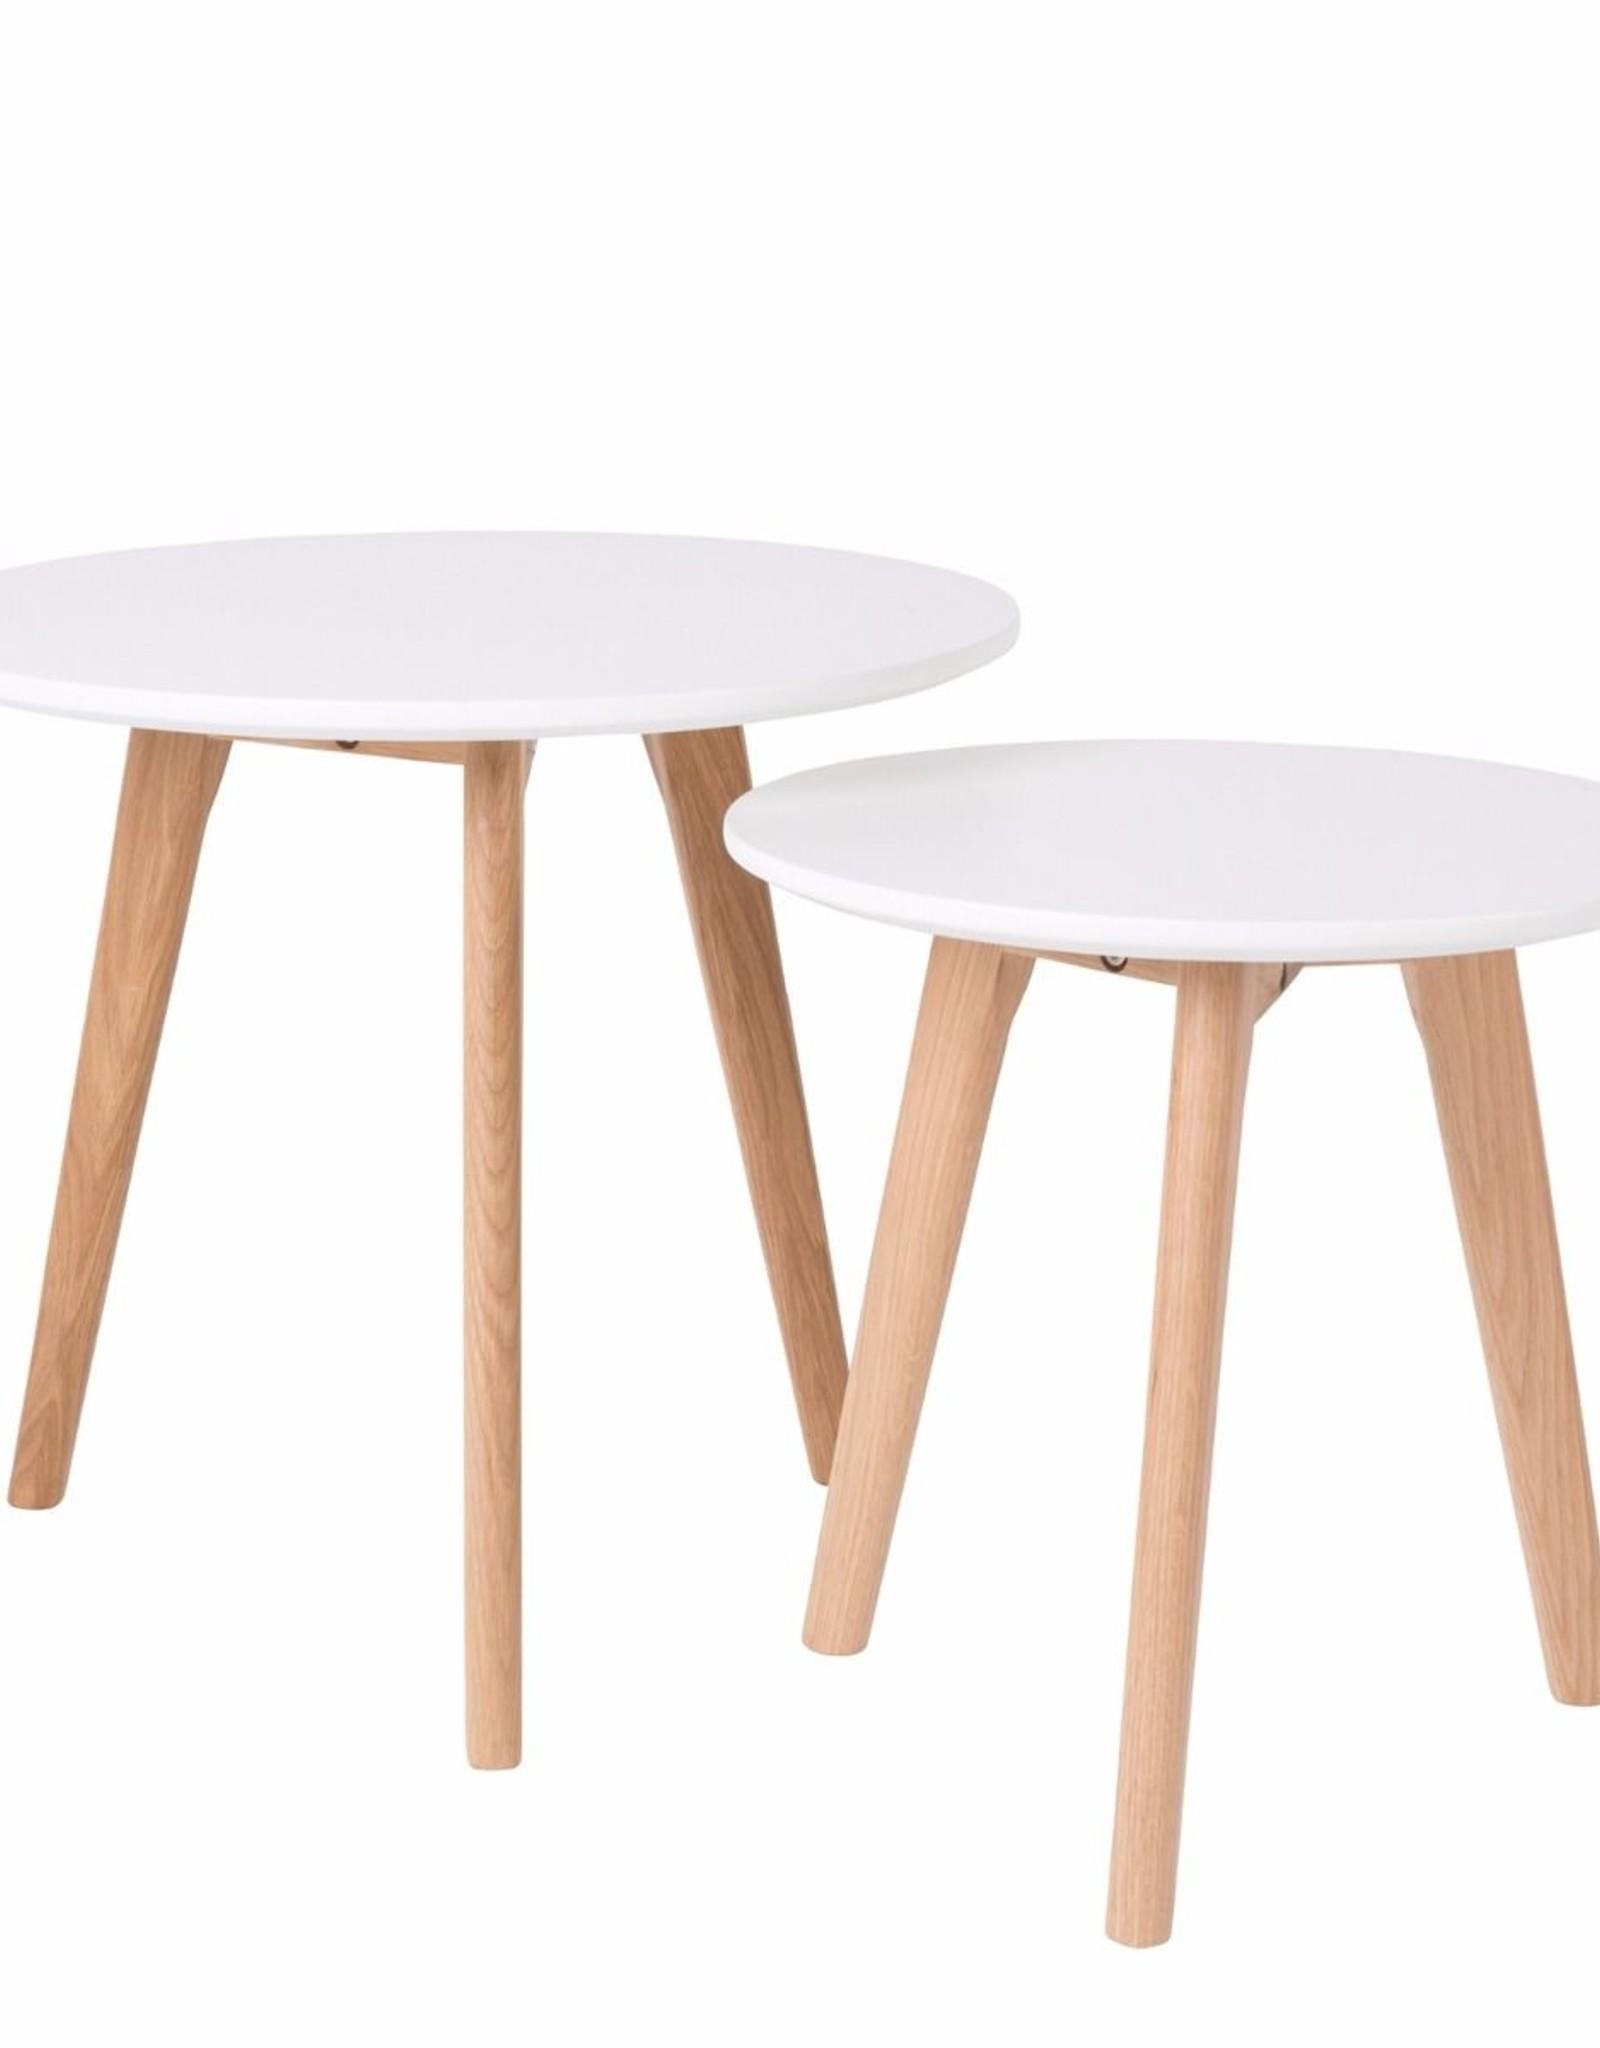 Thinkstyle - Side table bodine set of 2